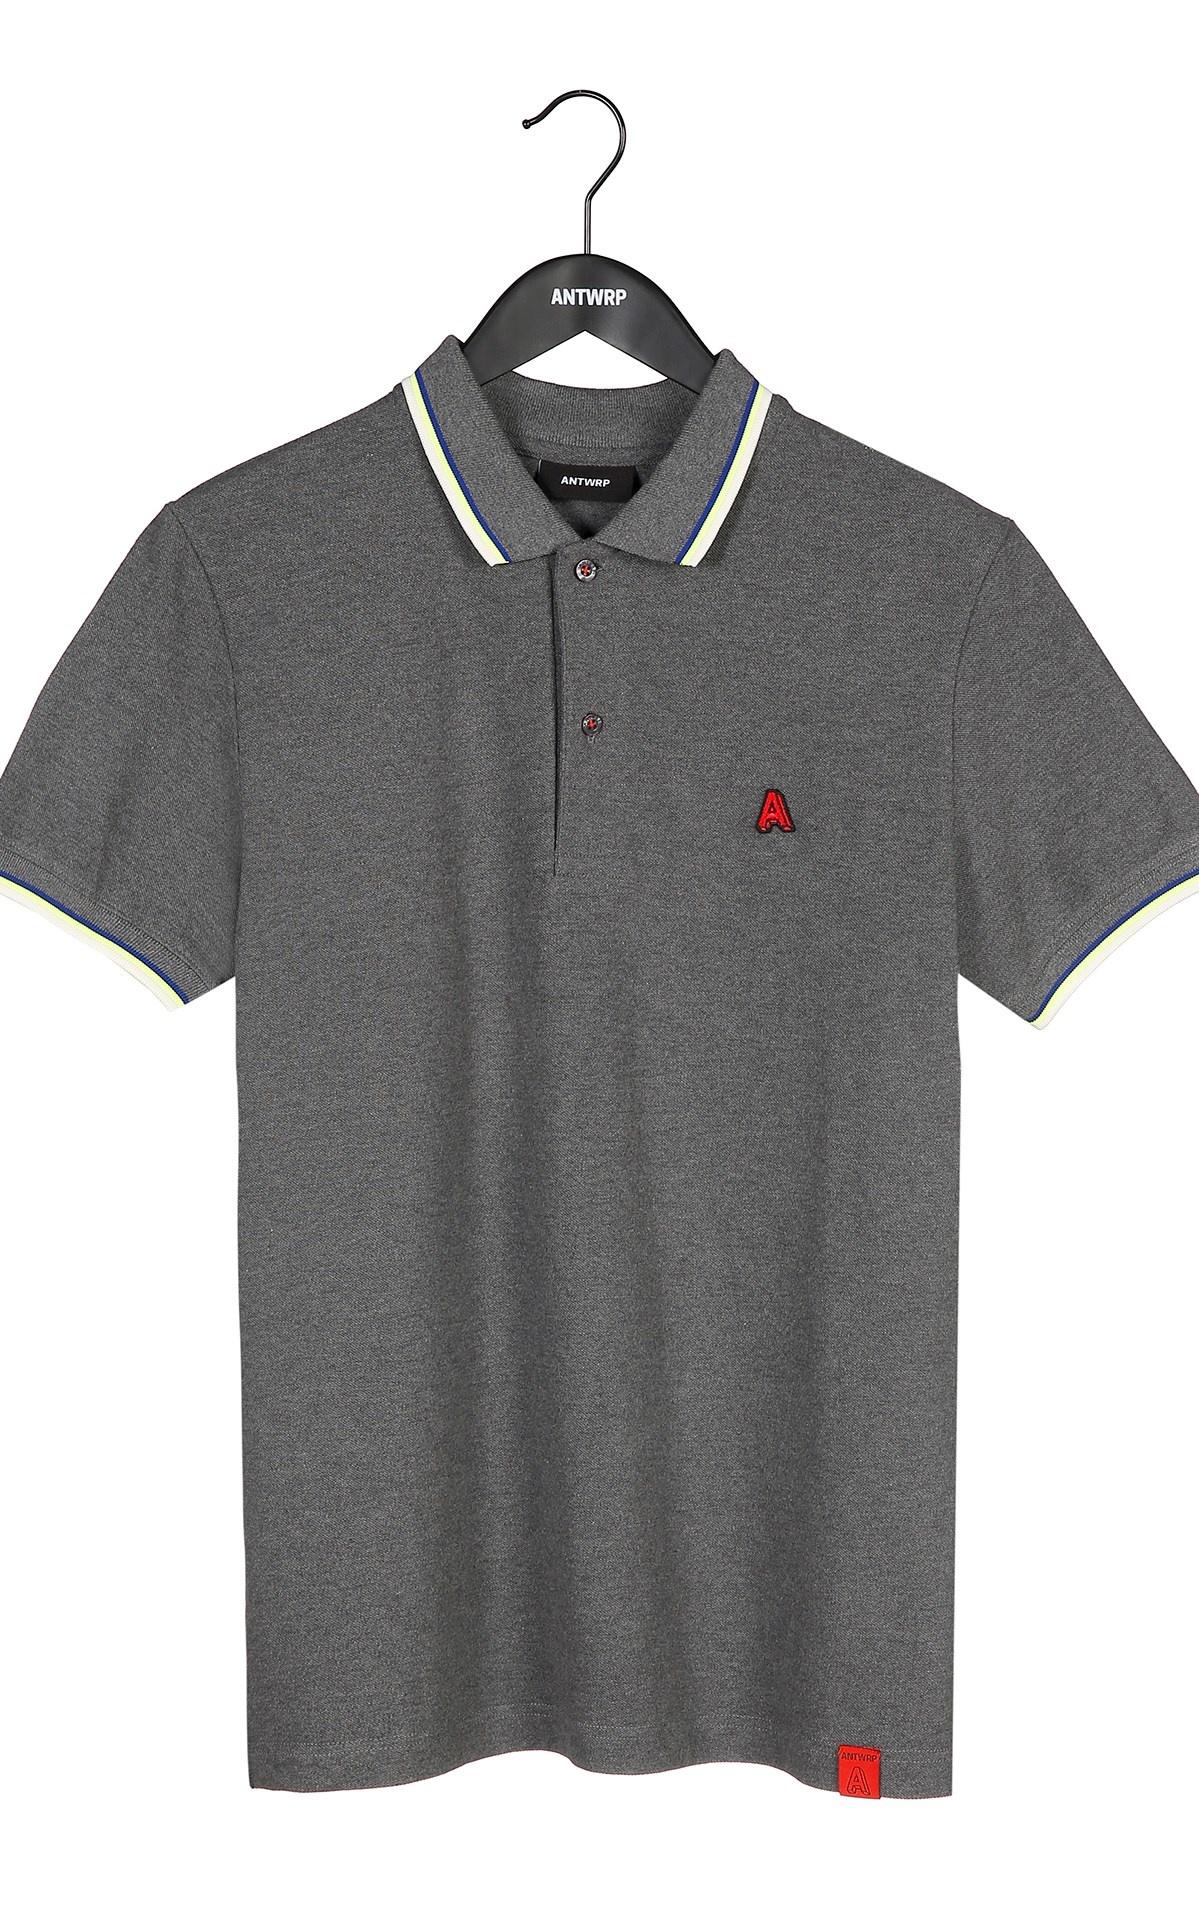 Antwrp Polo Antwrp 2002-BPO004-L031-002